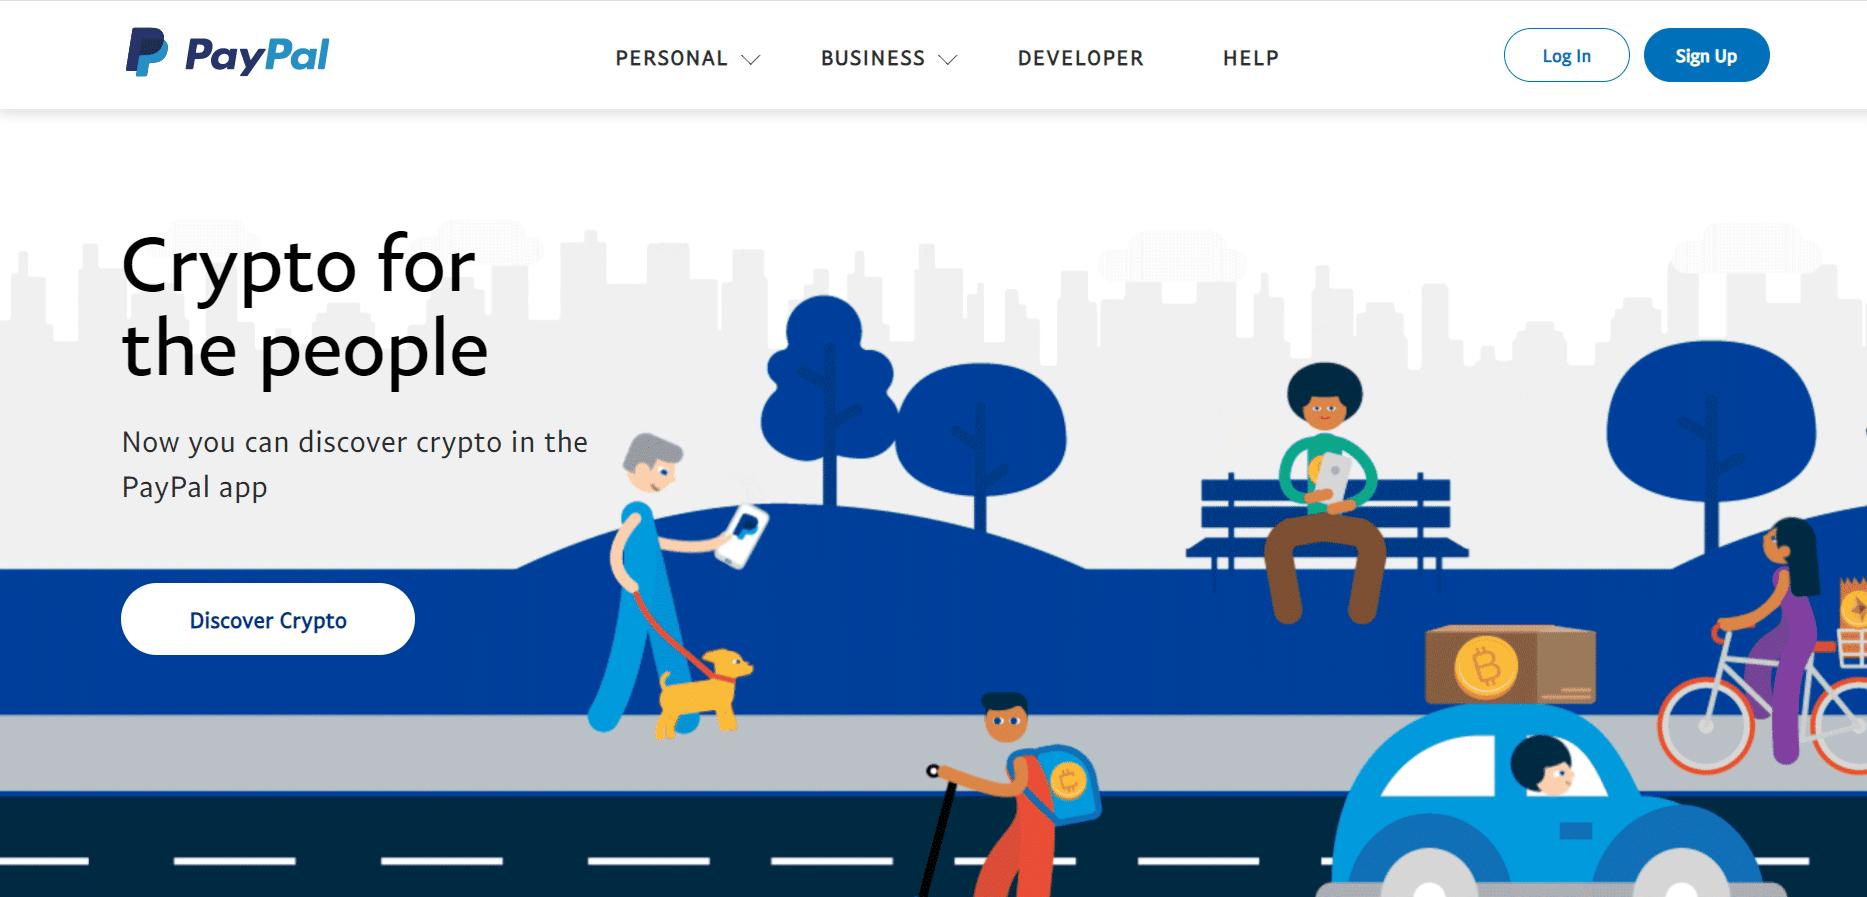 PayPal website